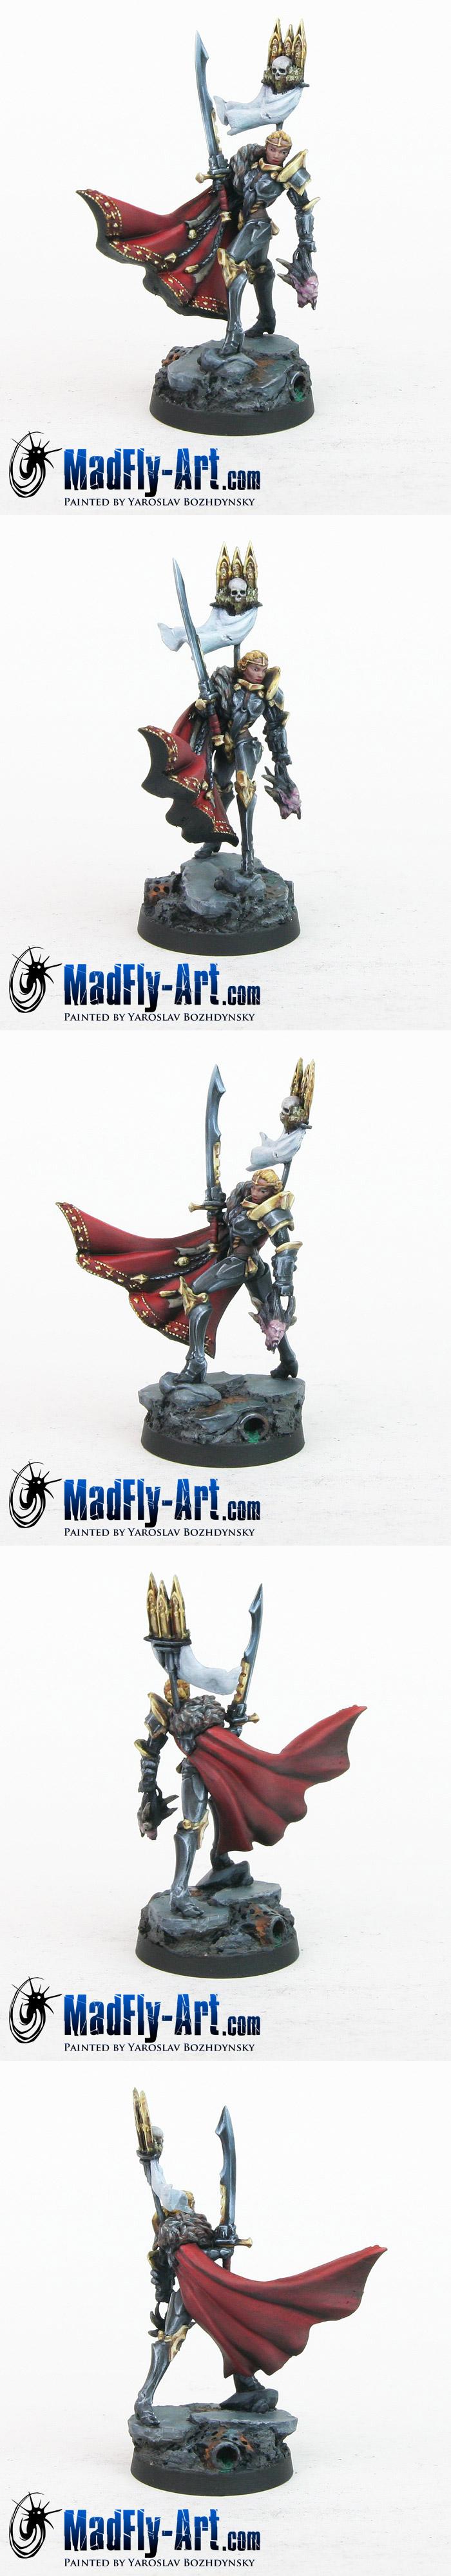 Mona de Costemore, Demon Slayer